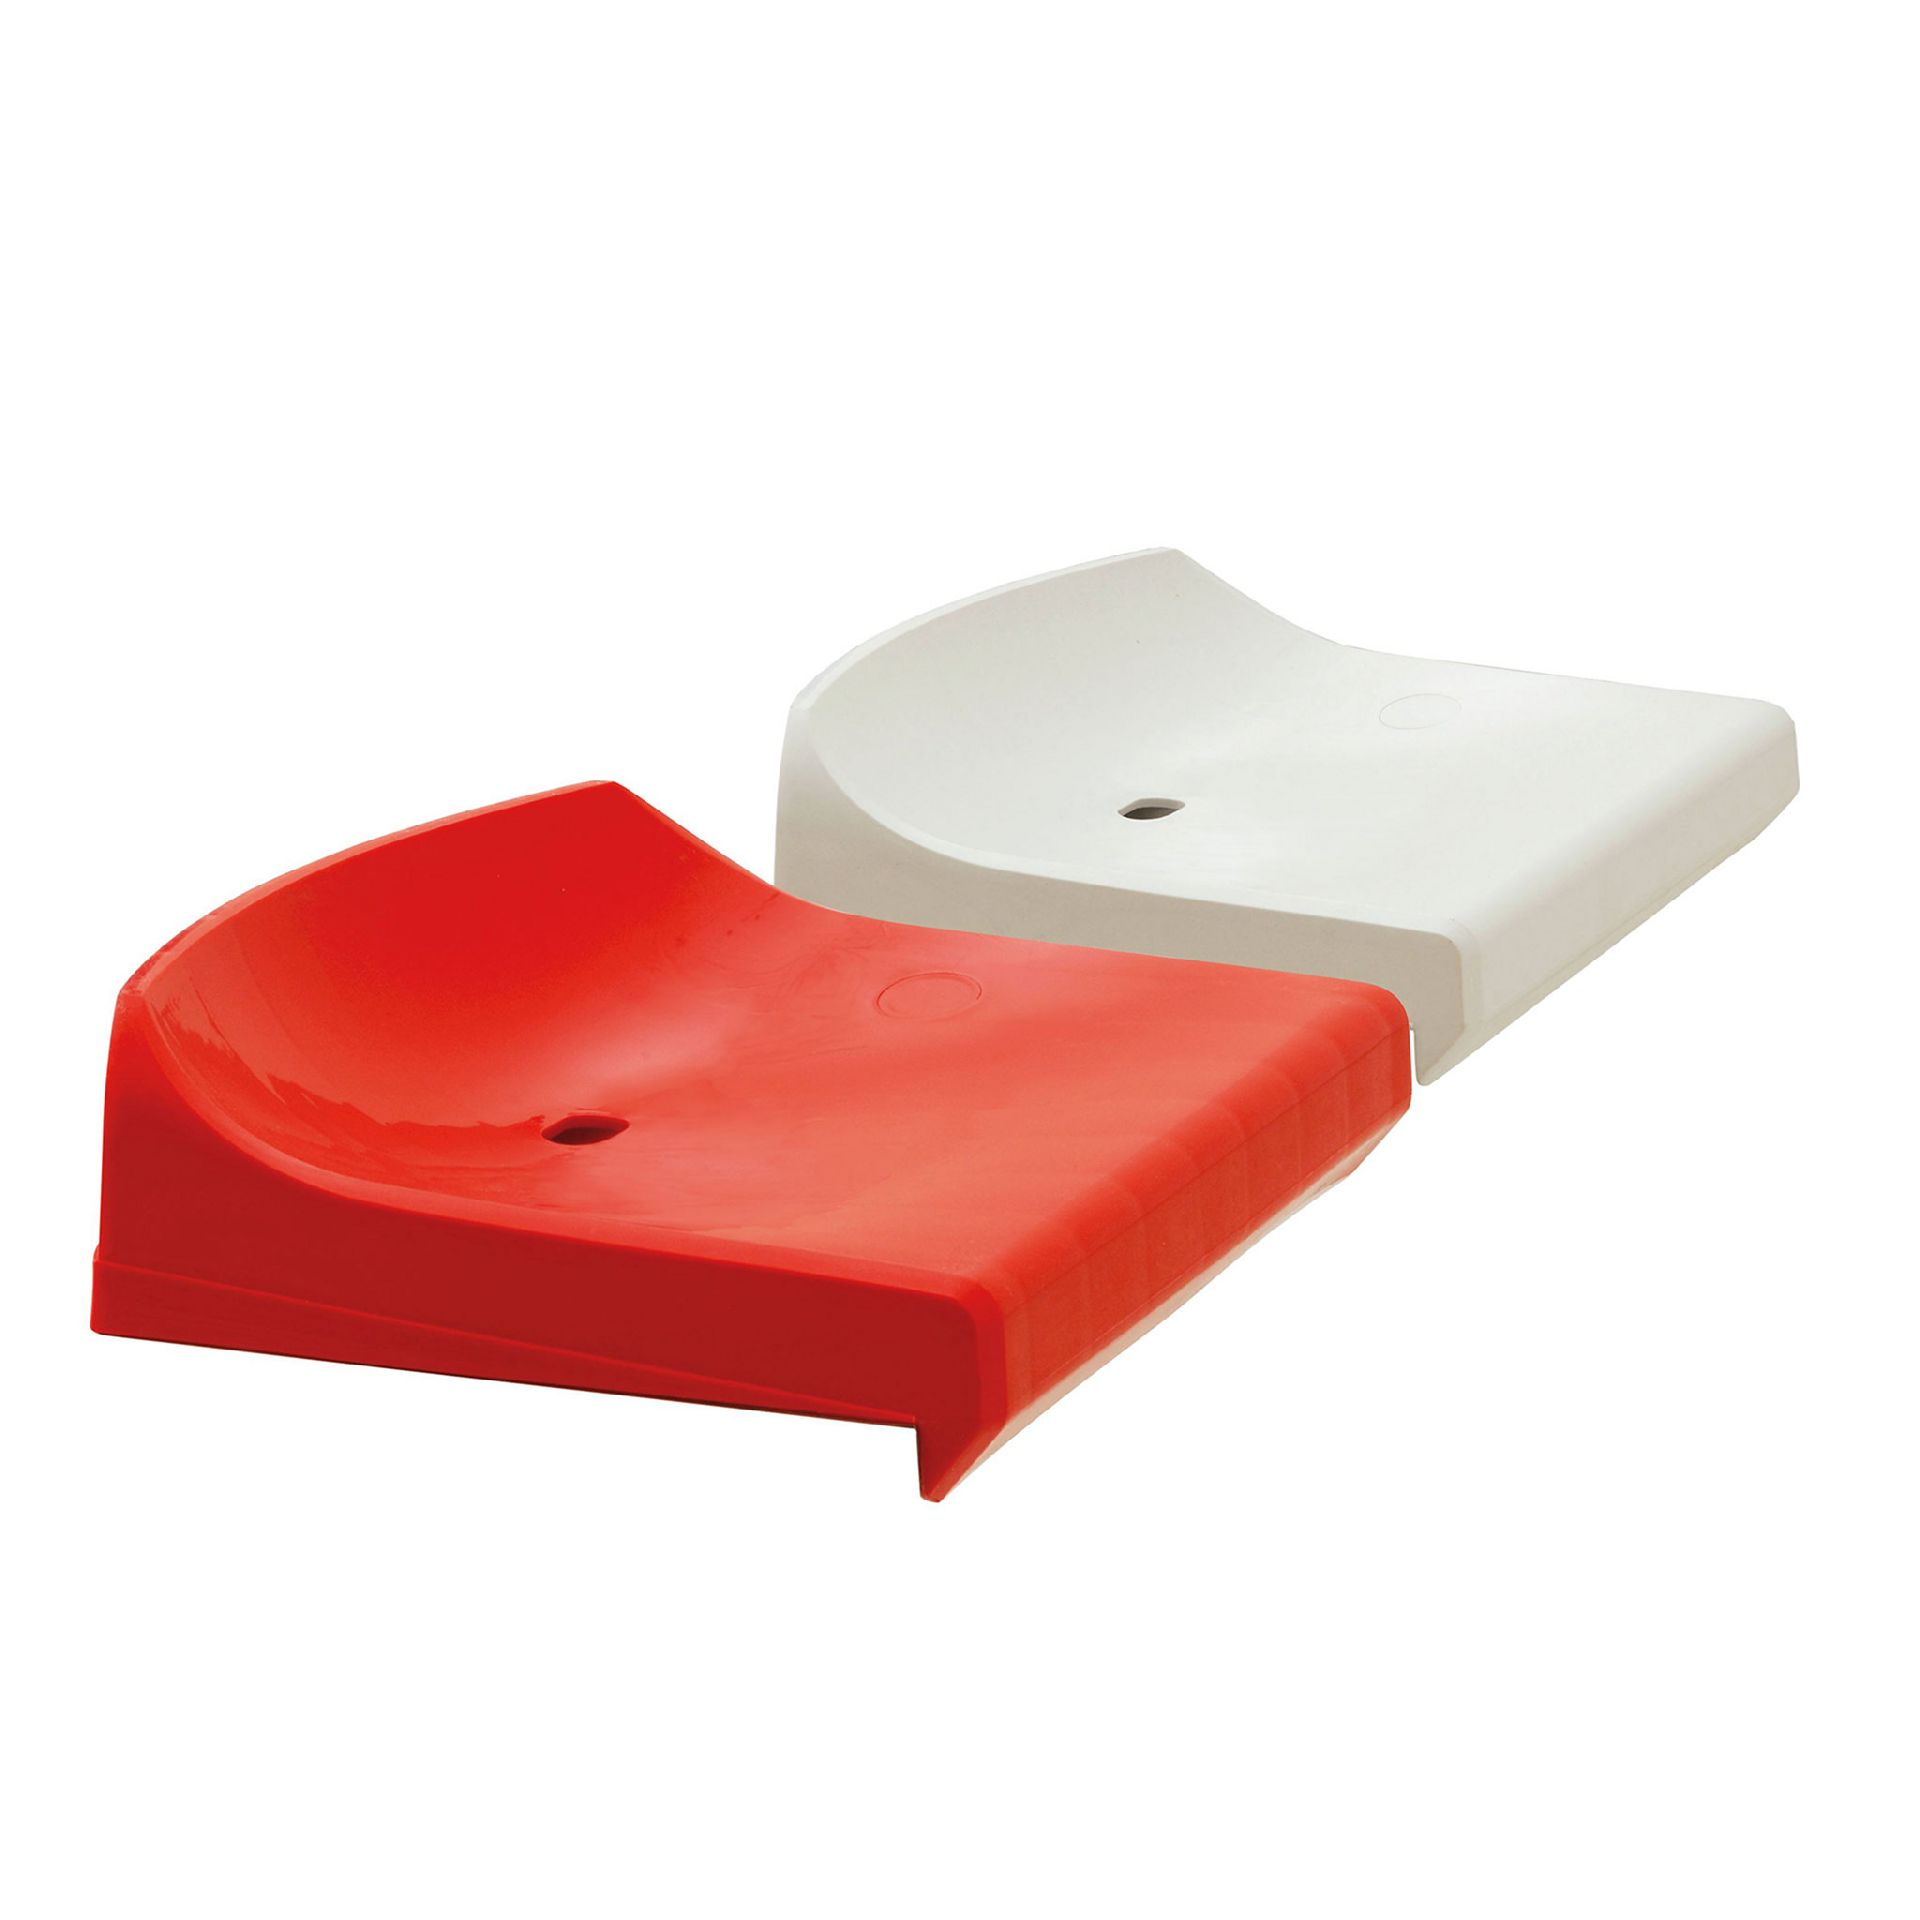 tema_backrest_monoblock_copolymer_pp_stadium_chair_seatorium_08